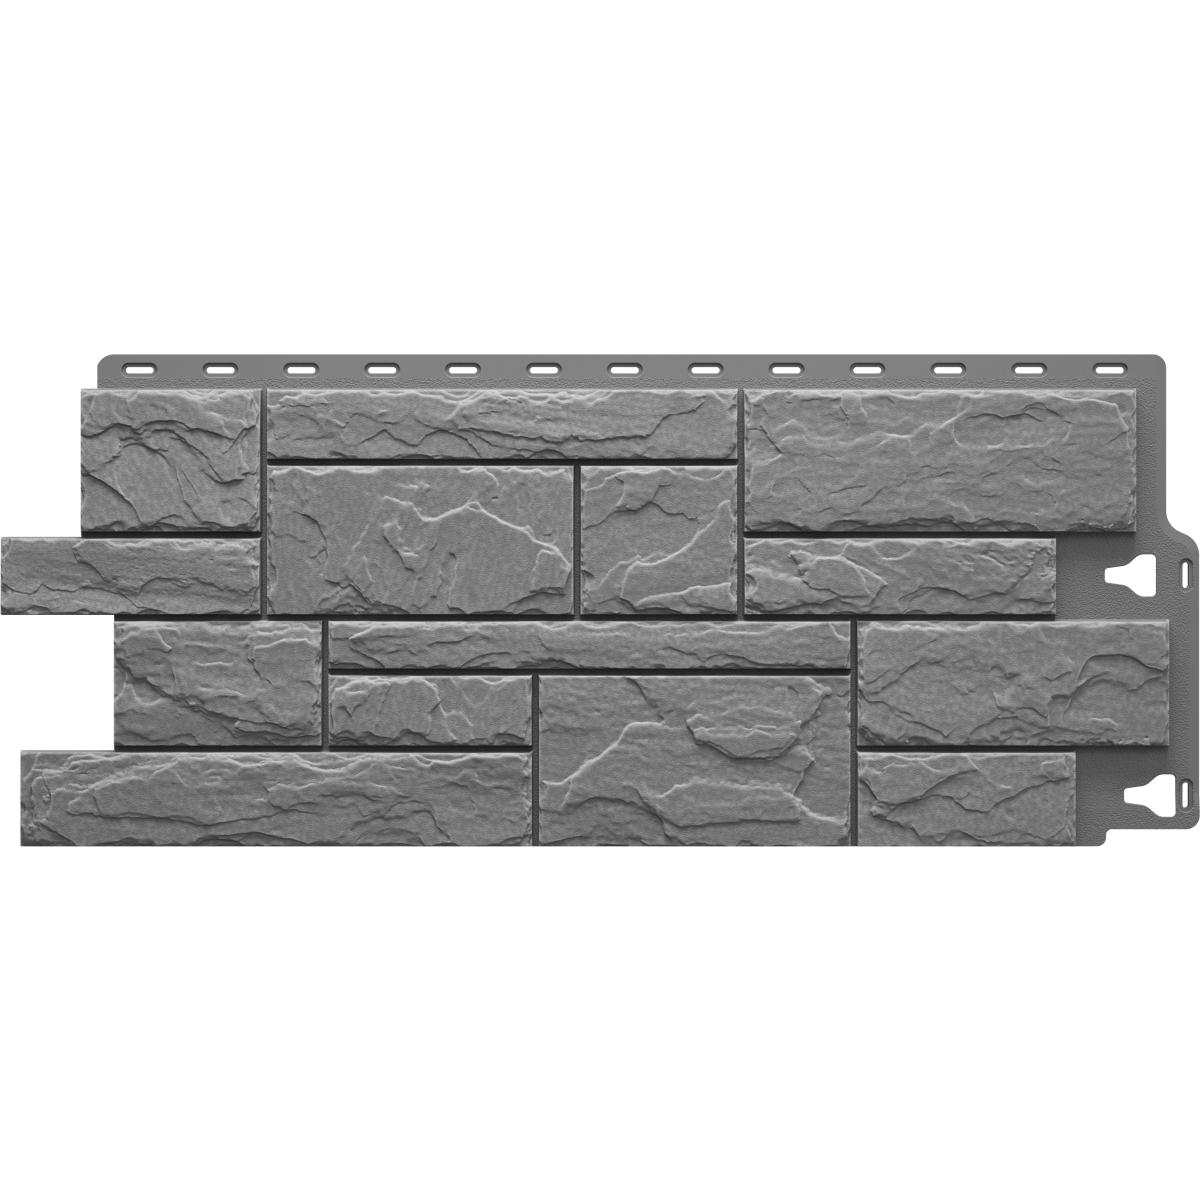 Фасадная панель Камень крупный цвет серый